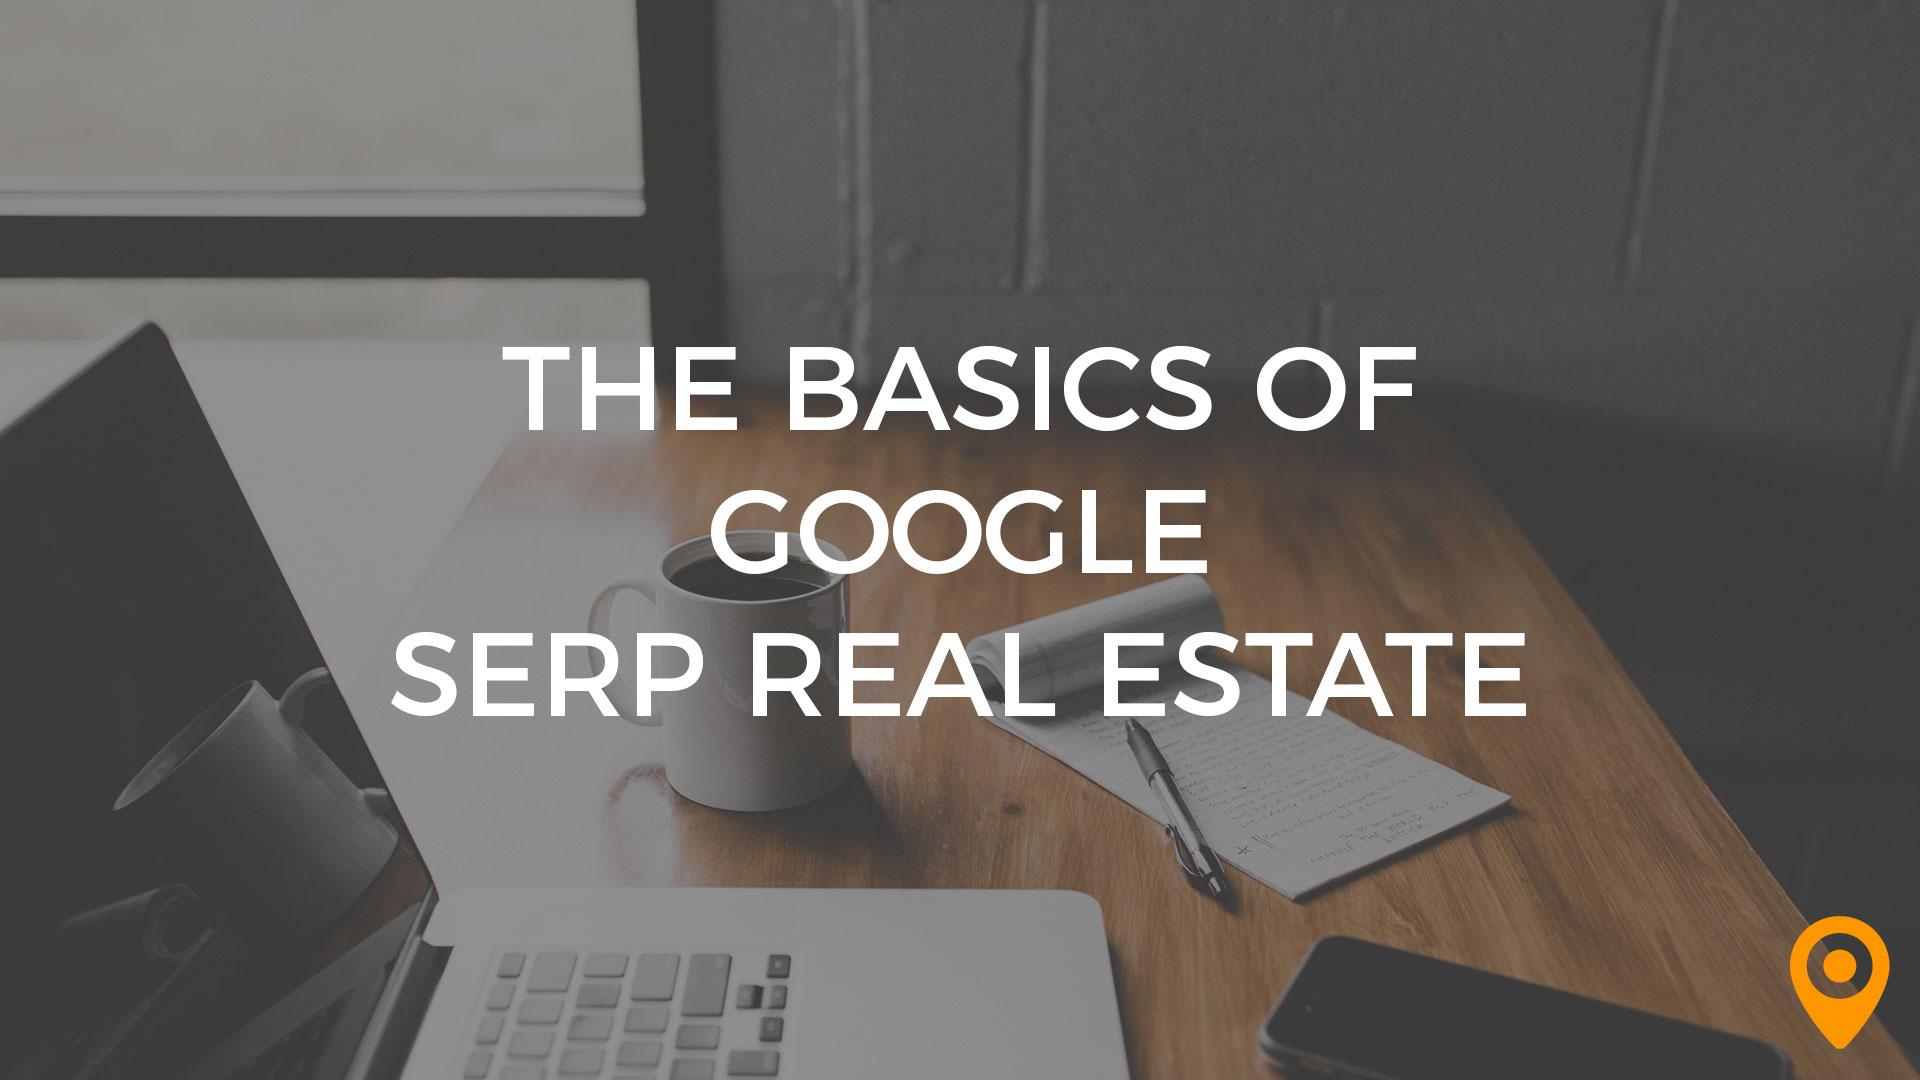 SERP Real Estate